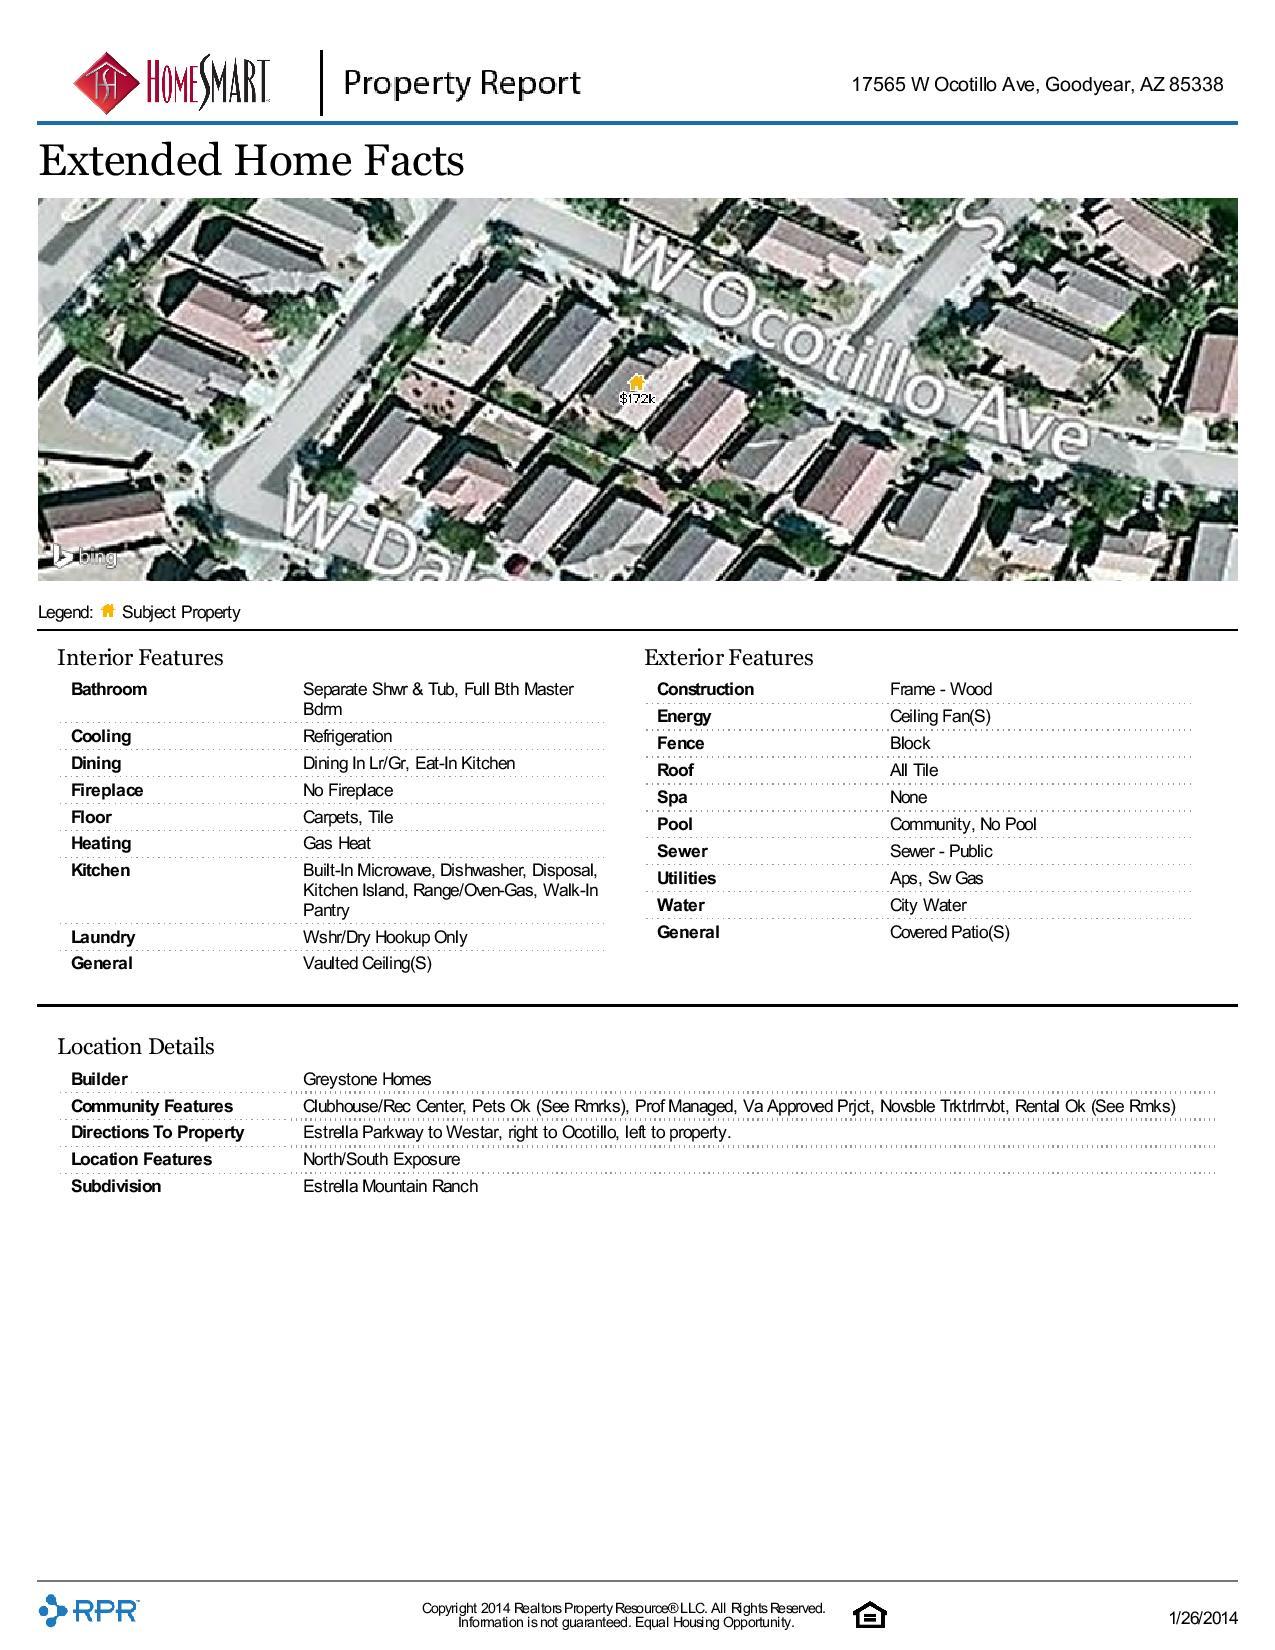 17565-W-Ocotillo-Ave-Goodyear-AZ-85338.pdf-page-004